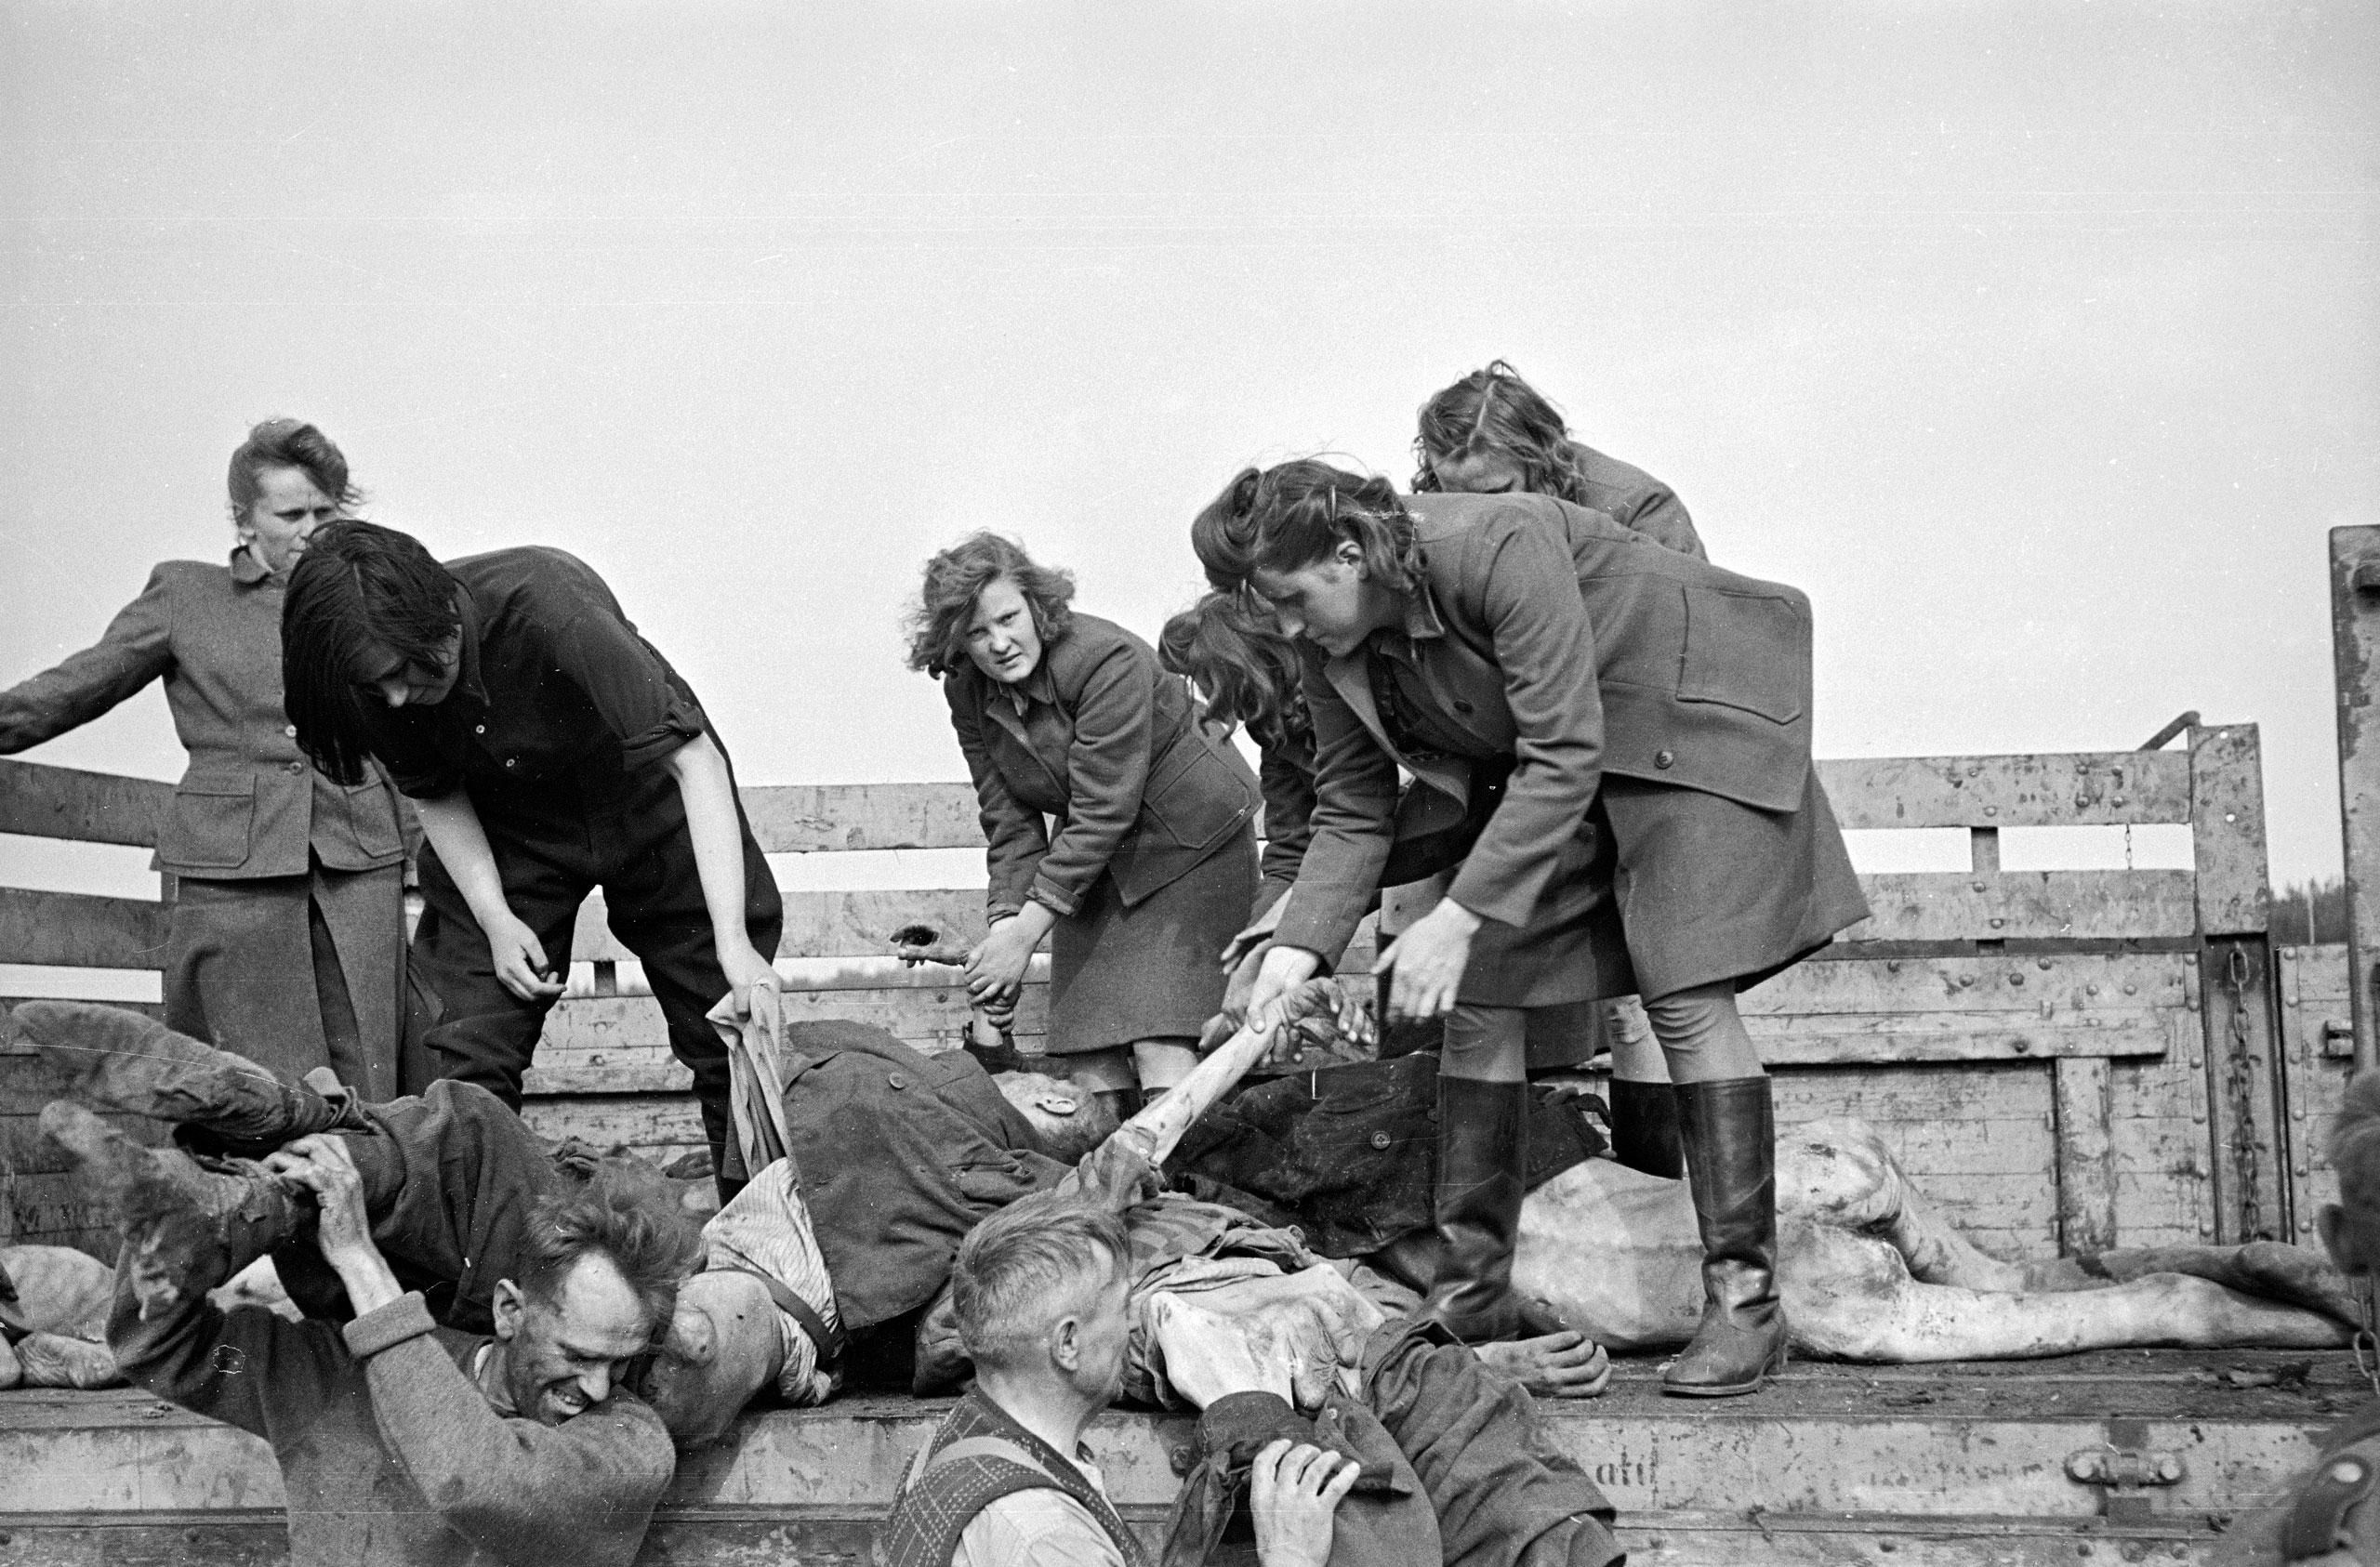 Female German camp guards unload a truck full of bodies of dead prisoners at Bergen-Belsen, April 1945.